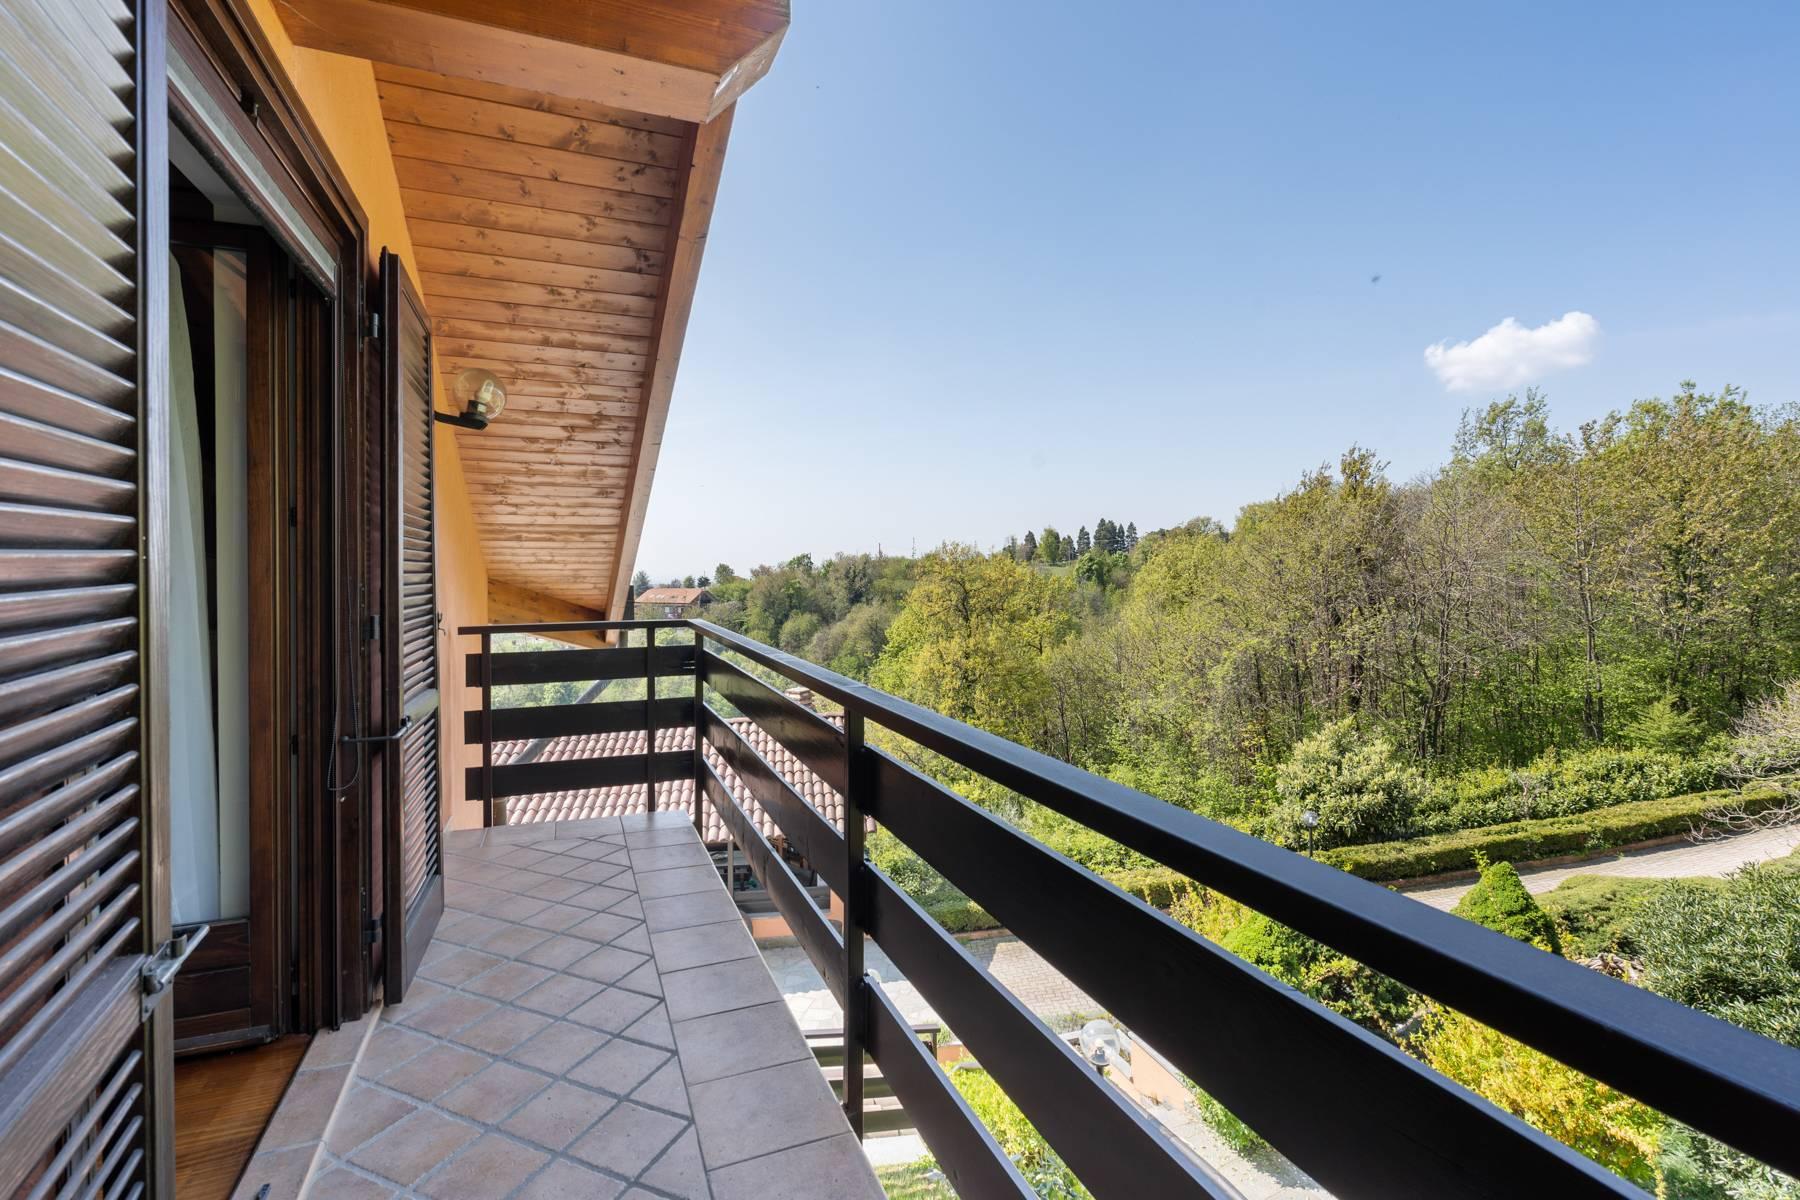 Villa in Vendita a Baldissero Torinese: 5 locali, 503 mq - Foto 15